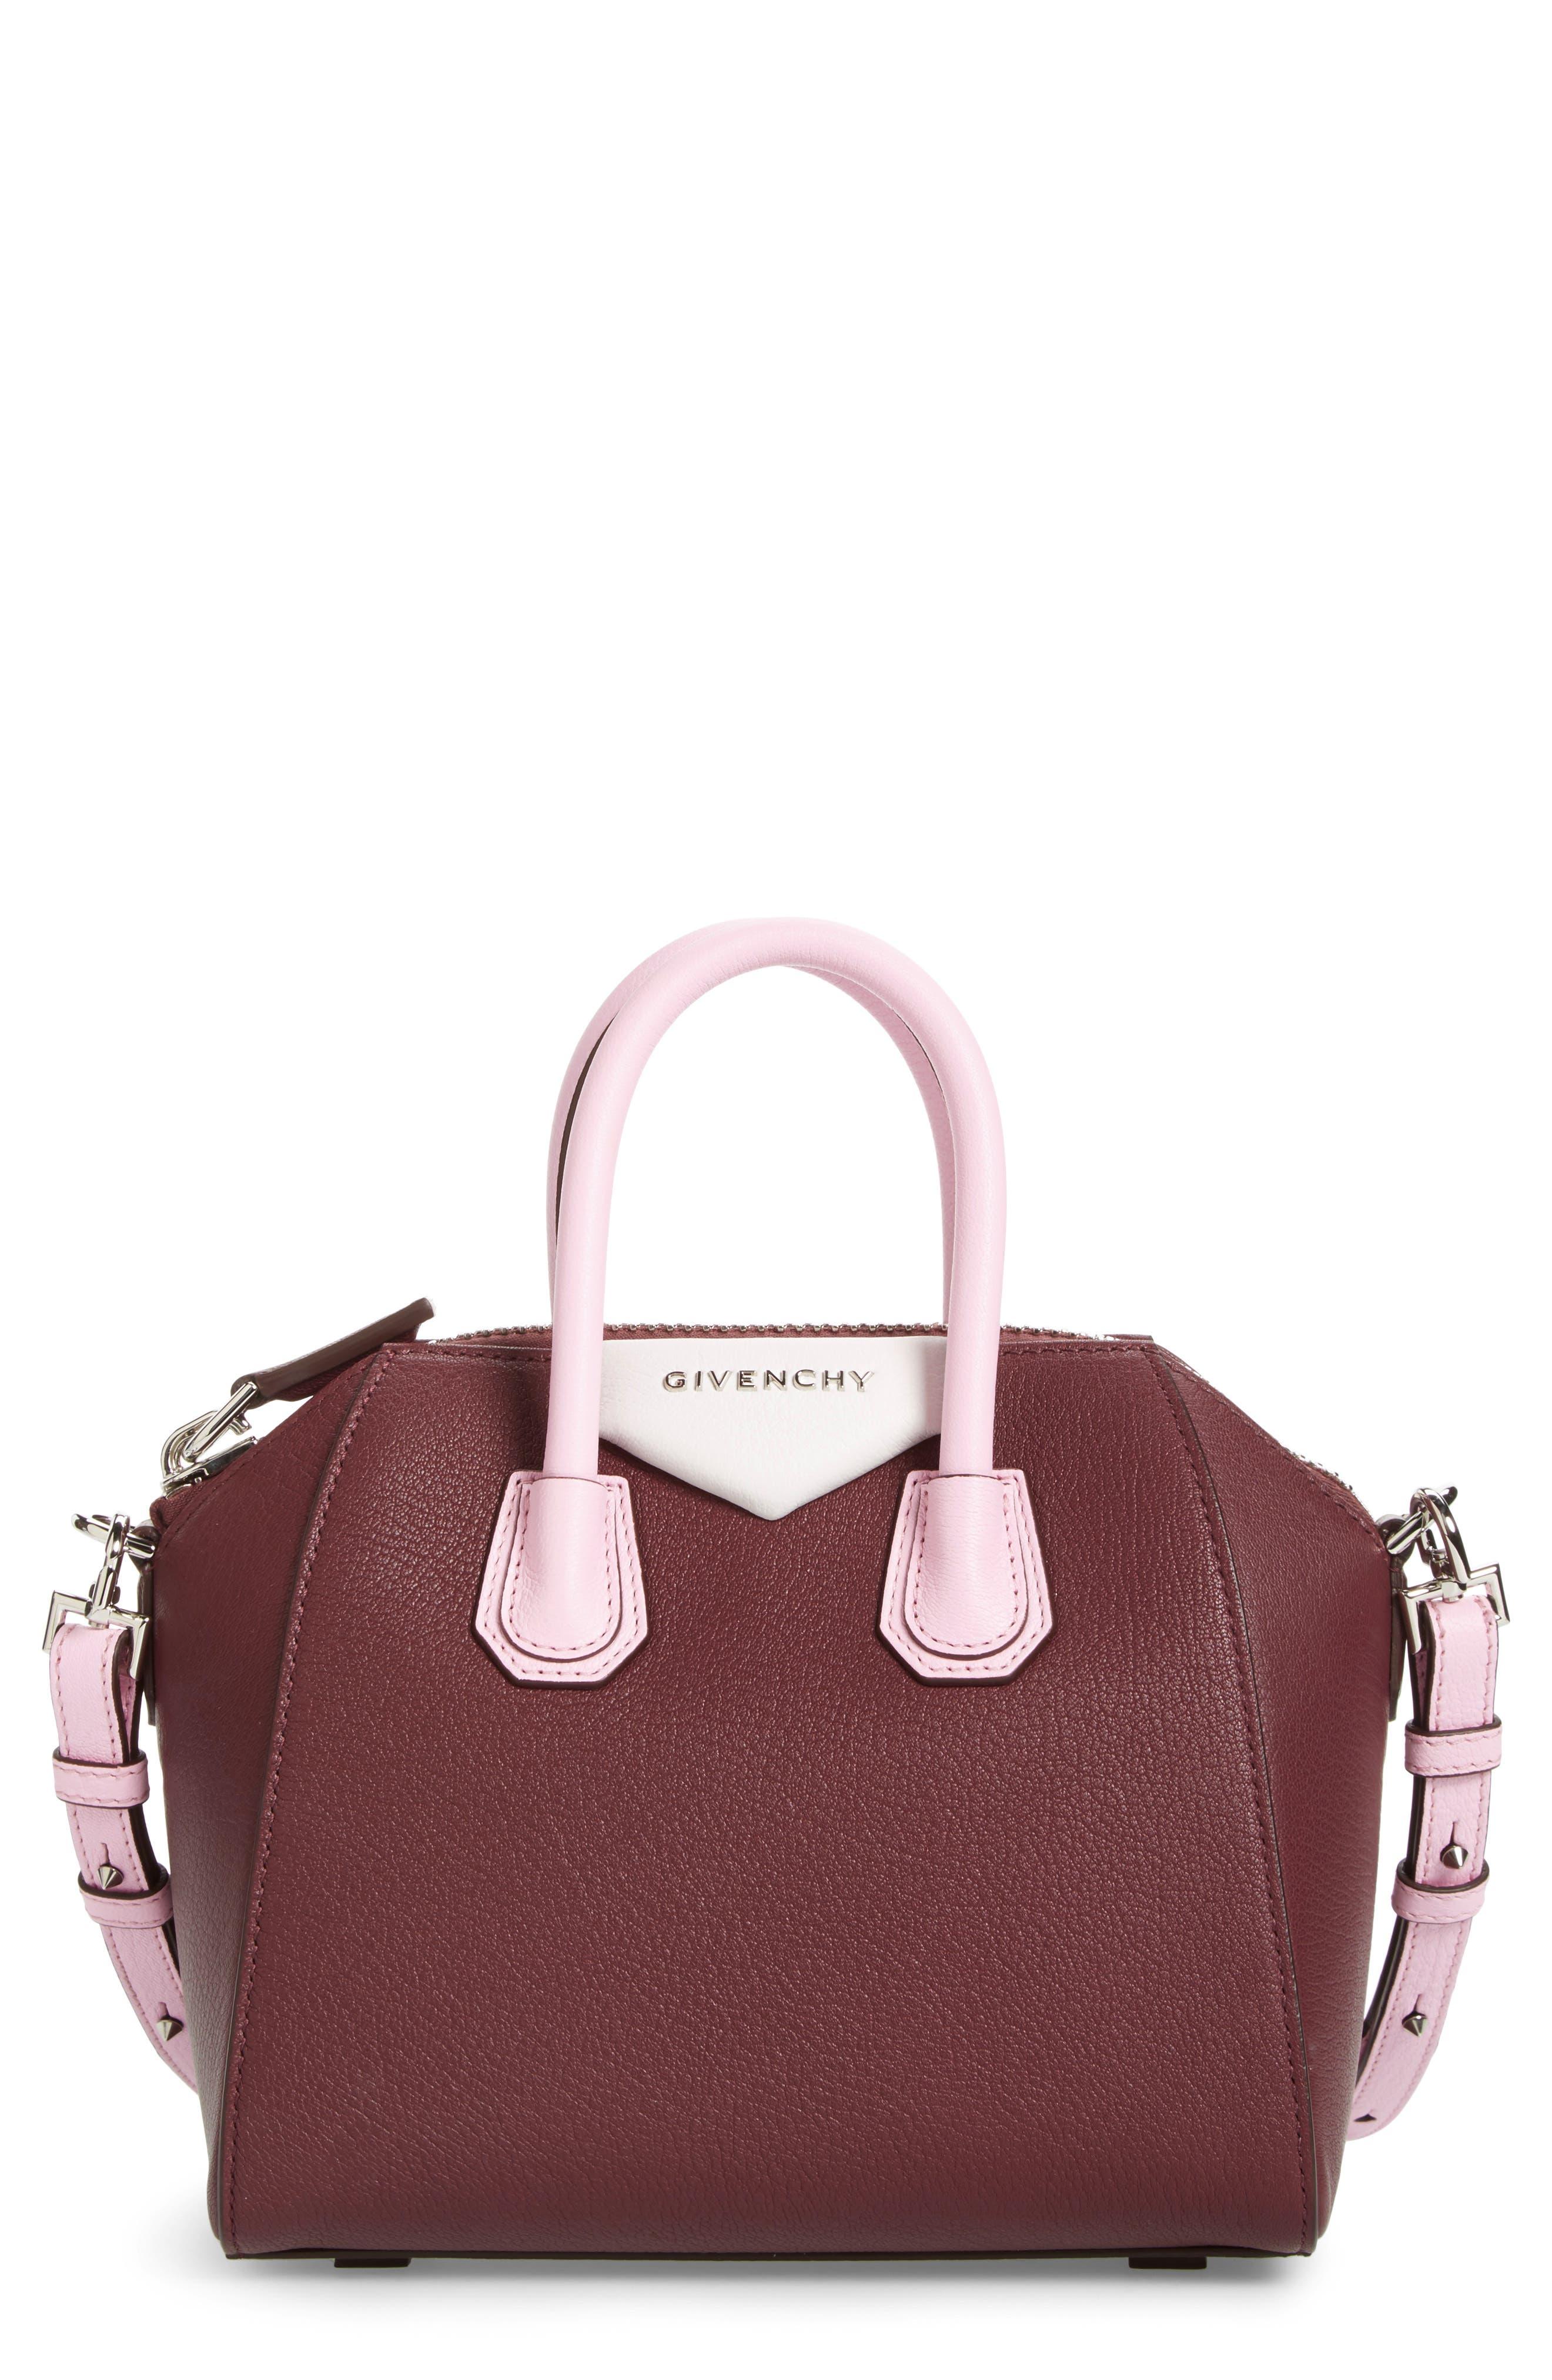 Mini Antigona Leather Top Handle Satchel,                             Main thumbnail 1, color,                             Burgundy/ Pink